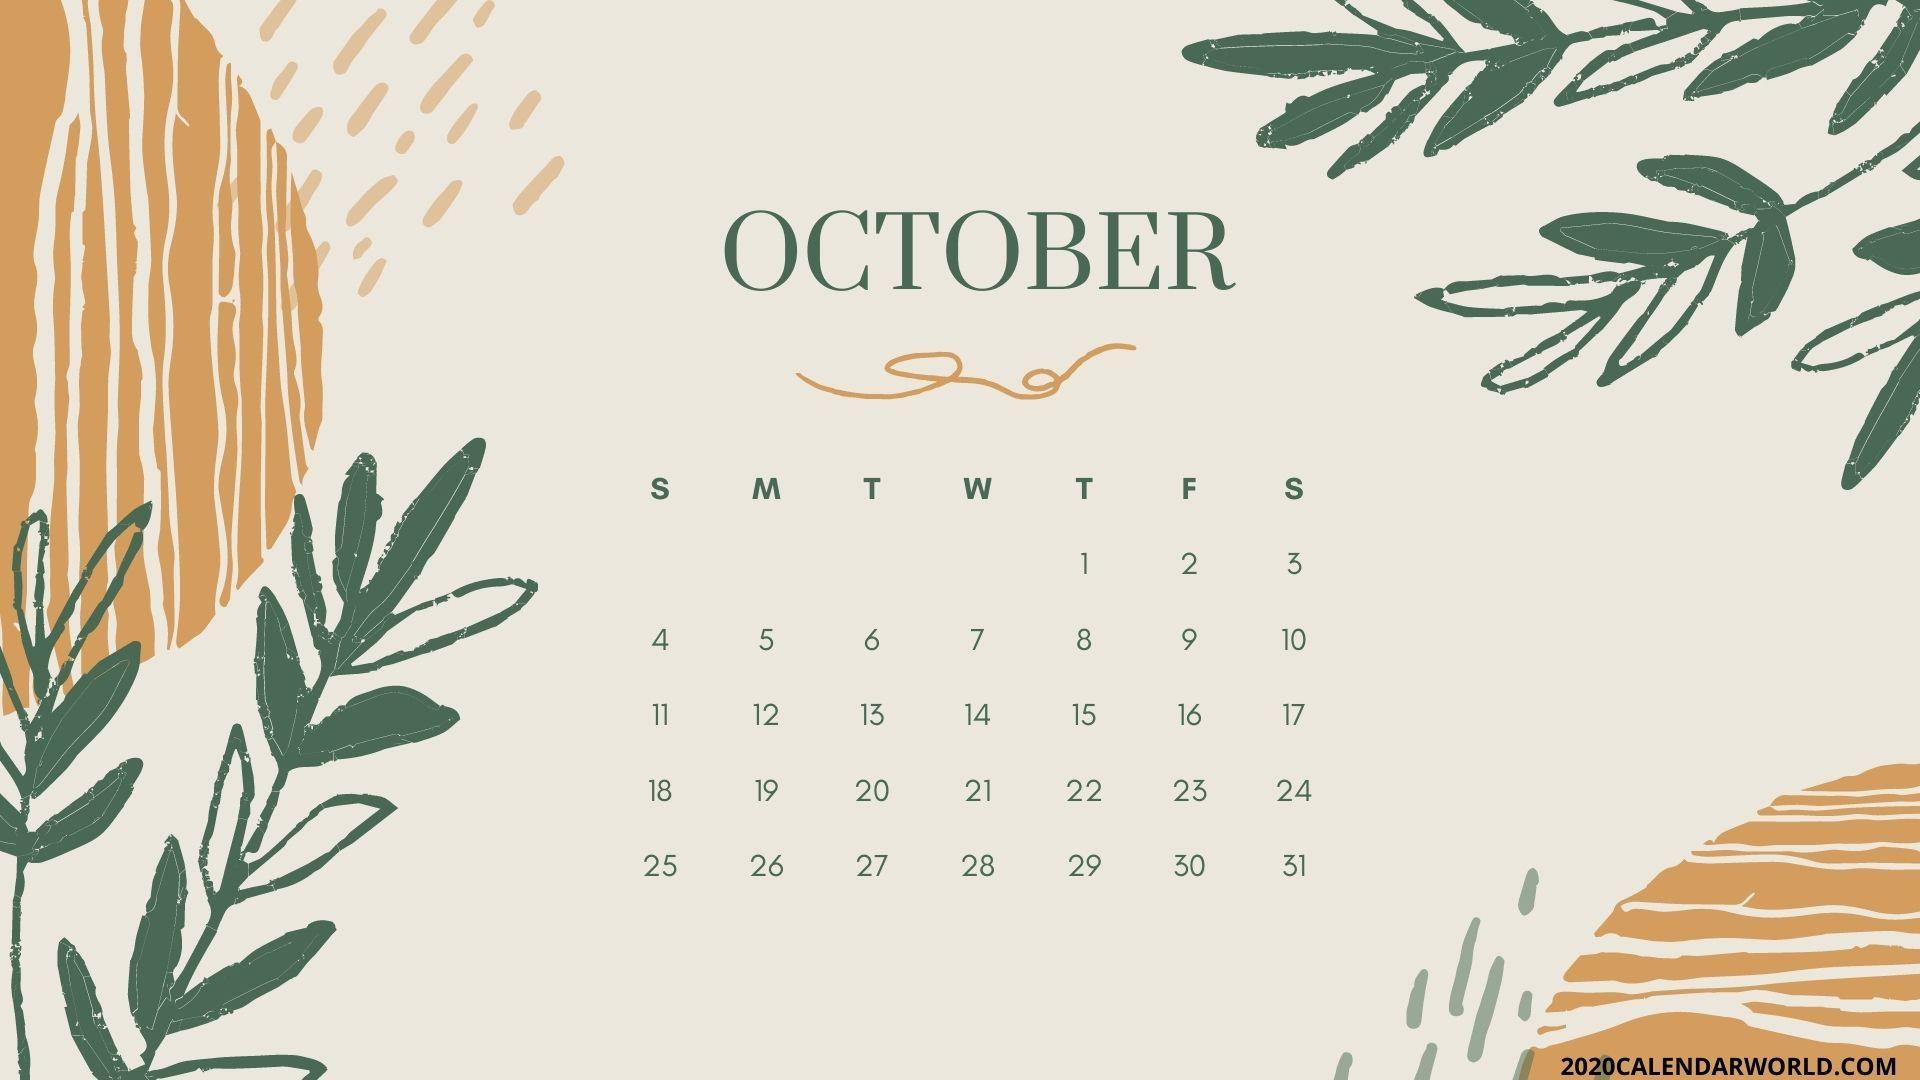 Floral October 2020 calendar for desktop Desktop wallpaper 1920x1080